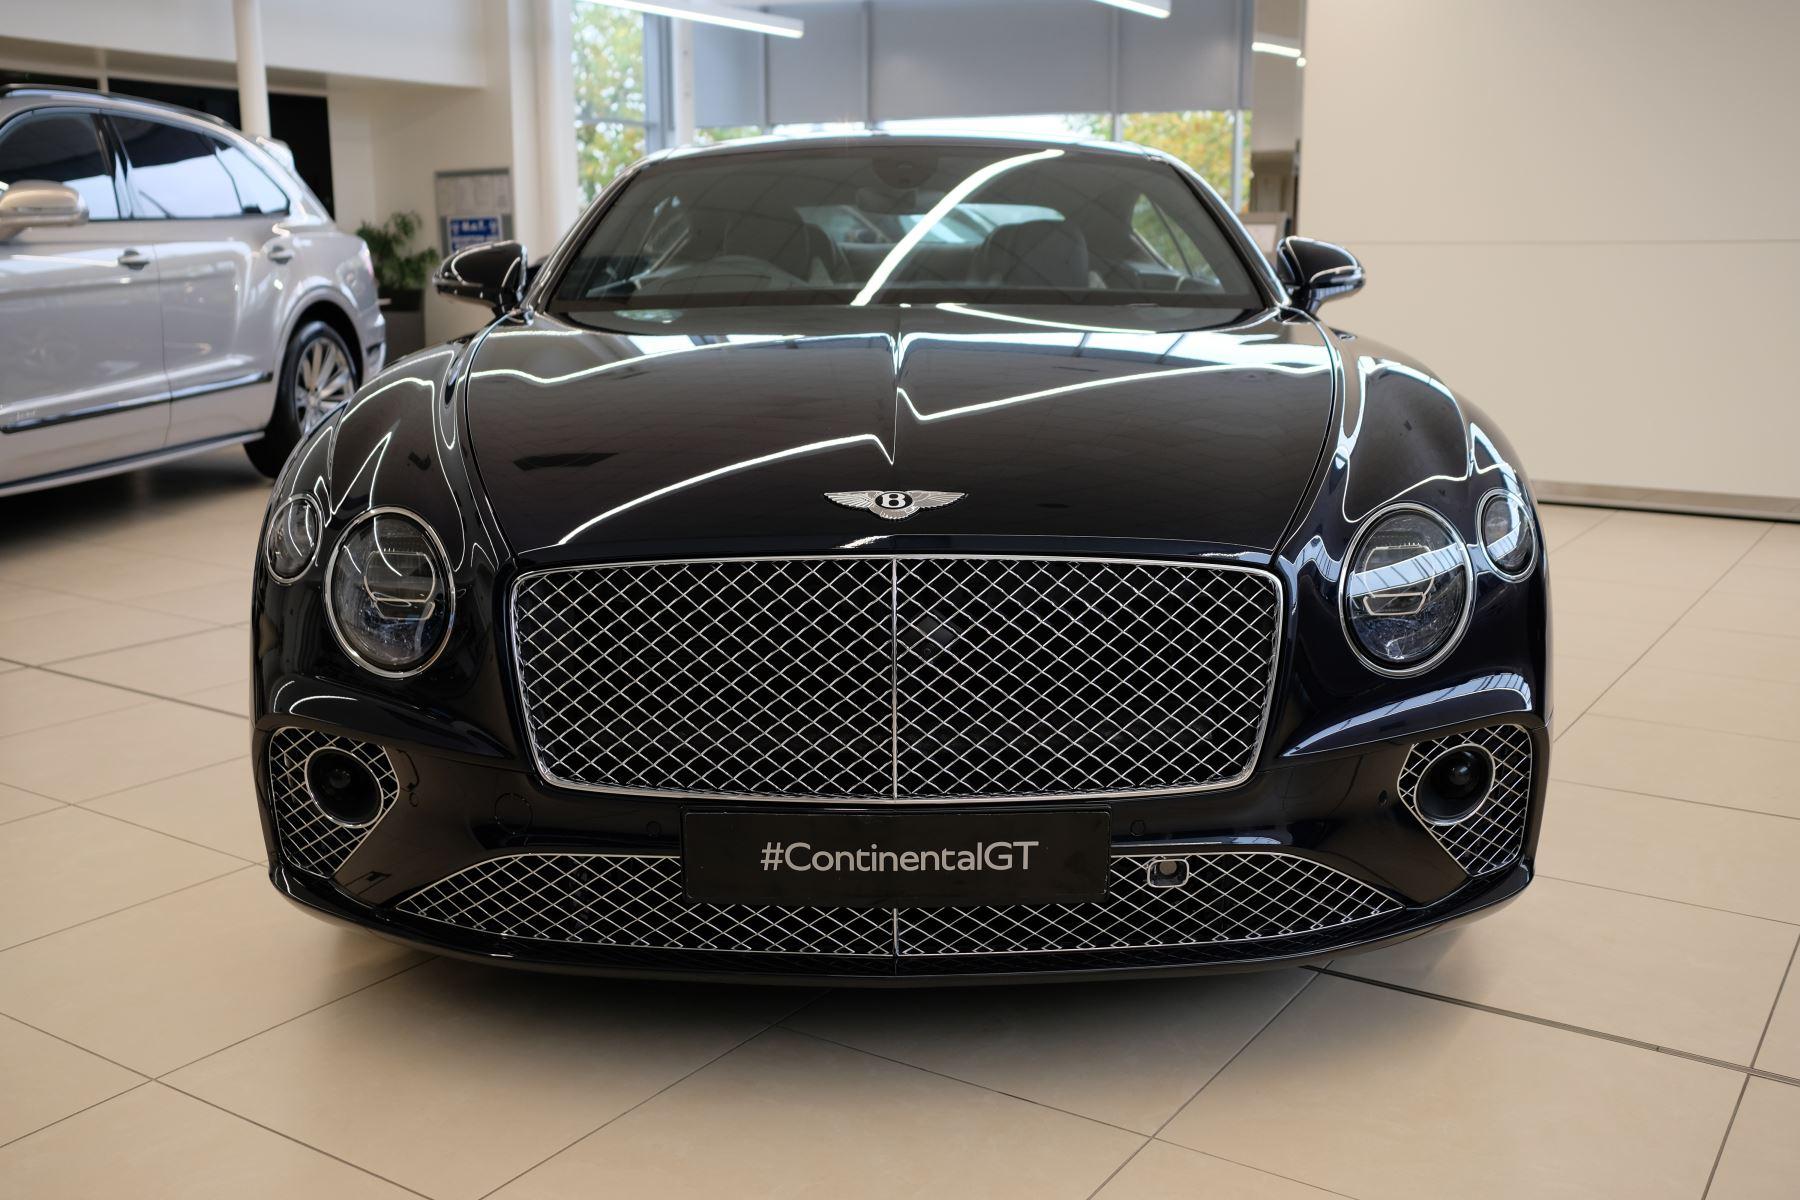 Bentley Continental GT 4.0 V8 Mulliner Edition Auto [Tour Spec] image 2